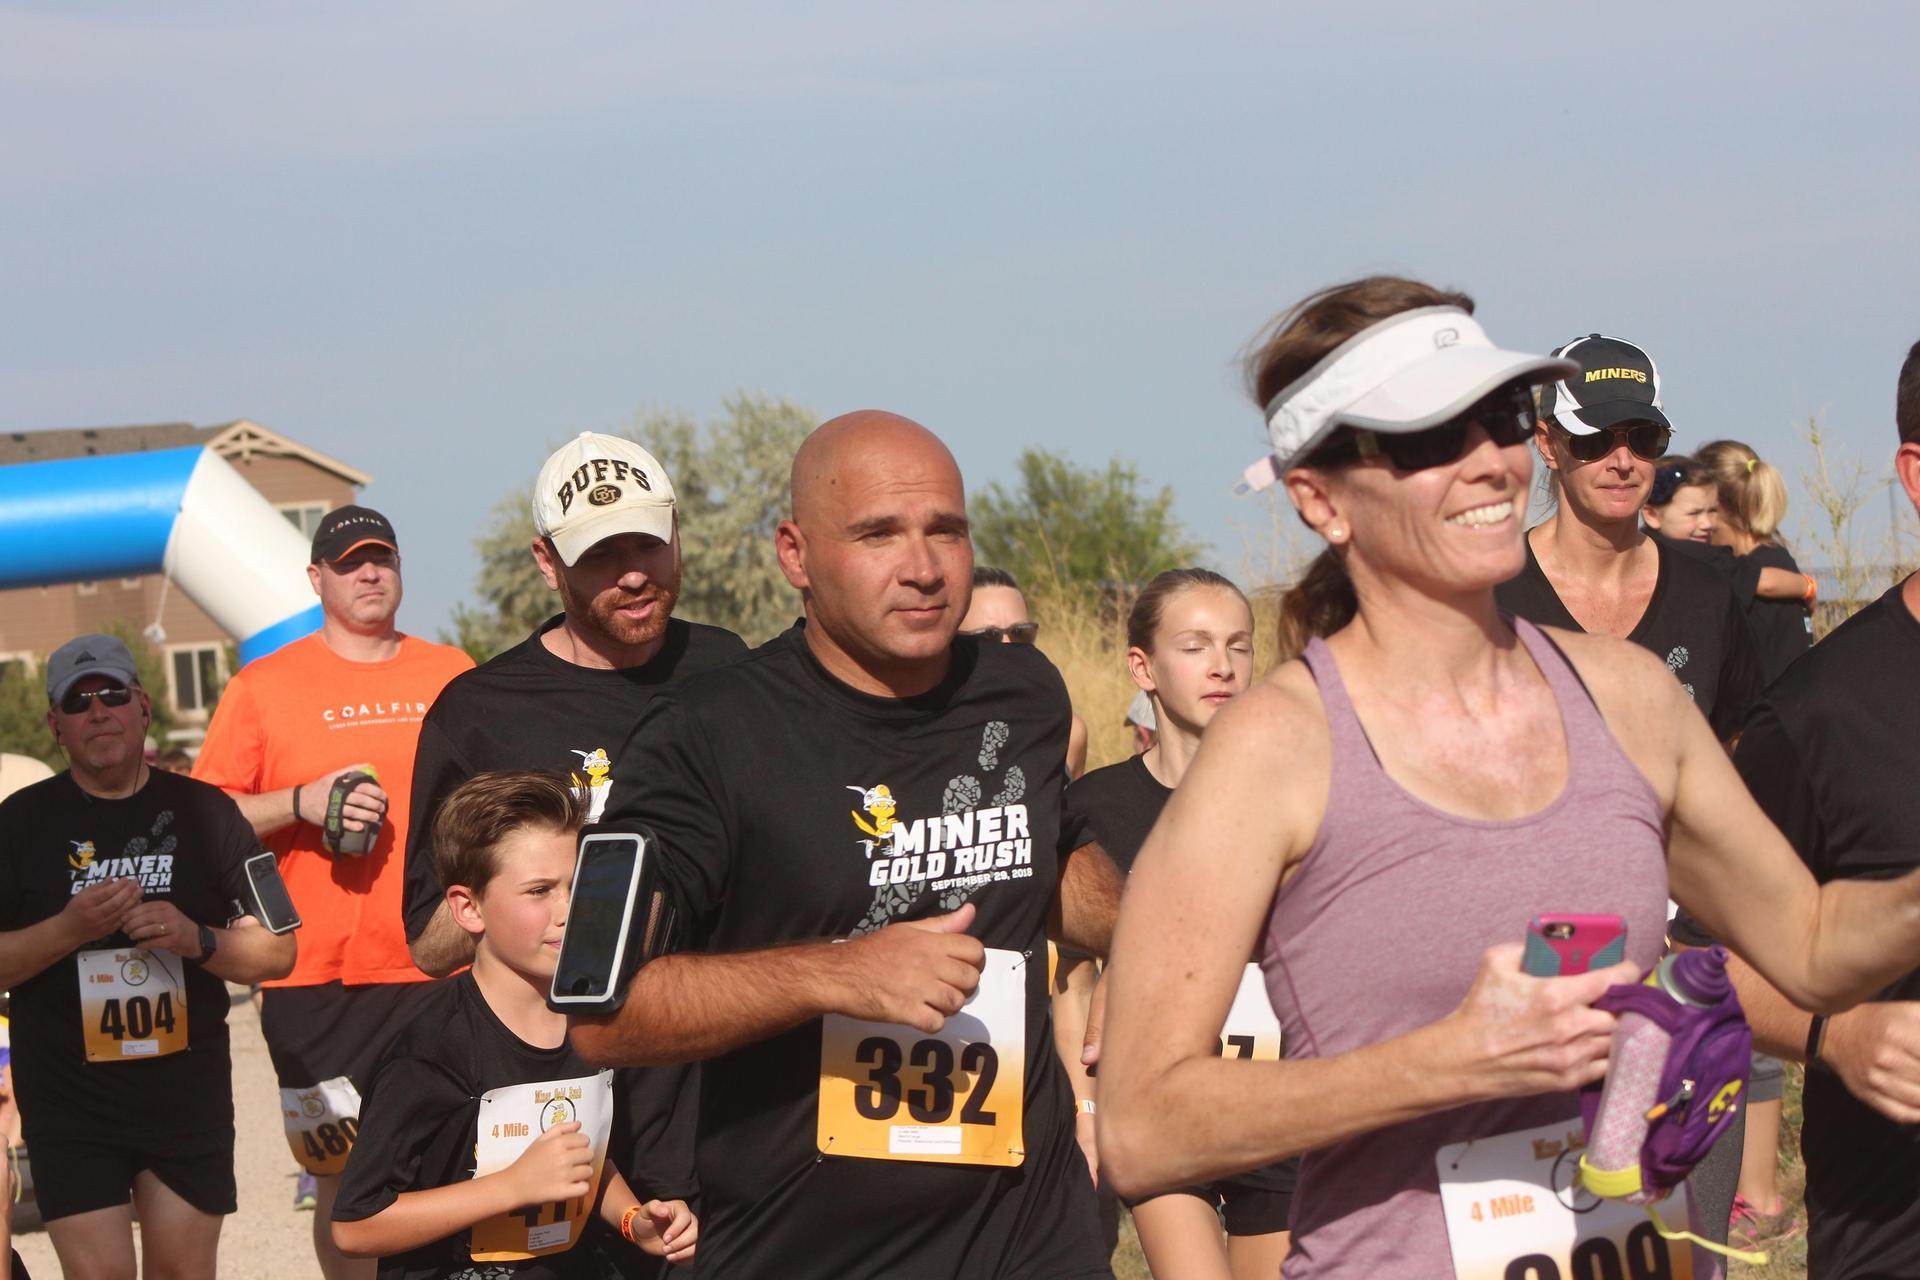 MGR Runners